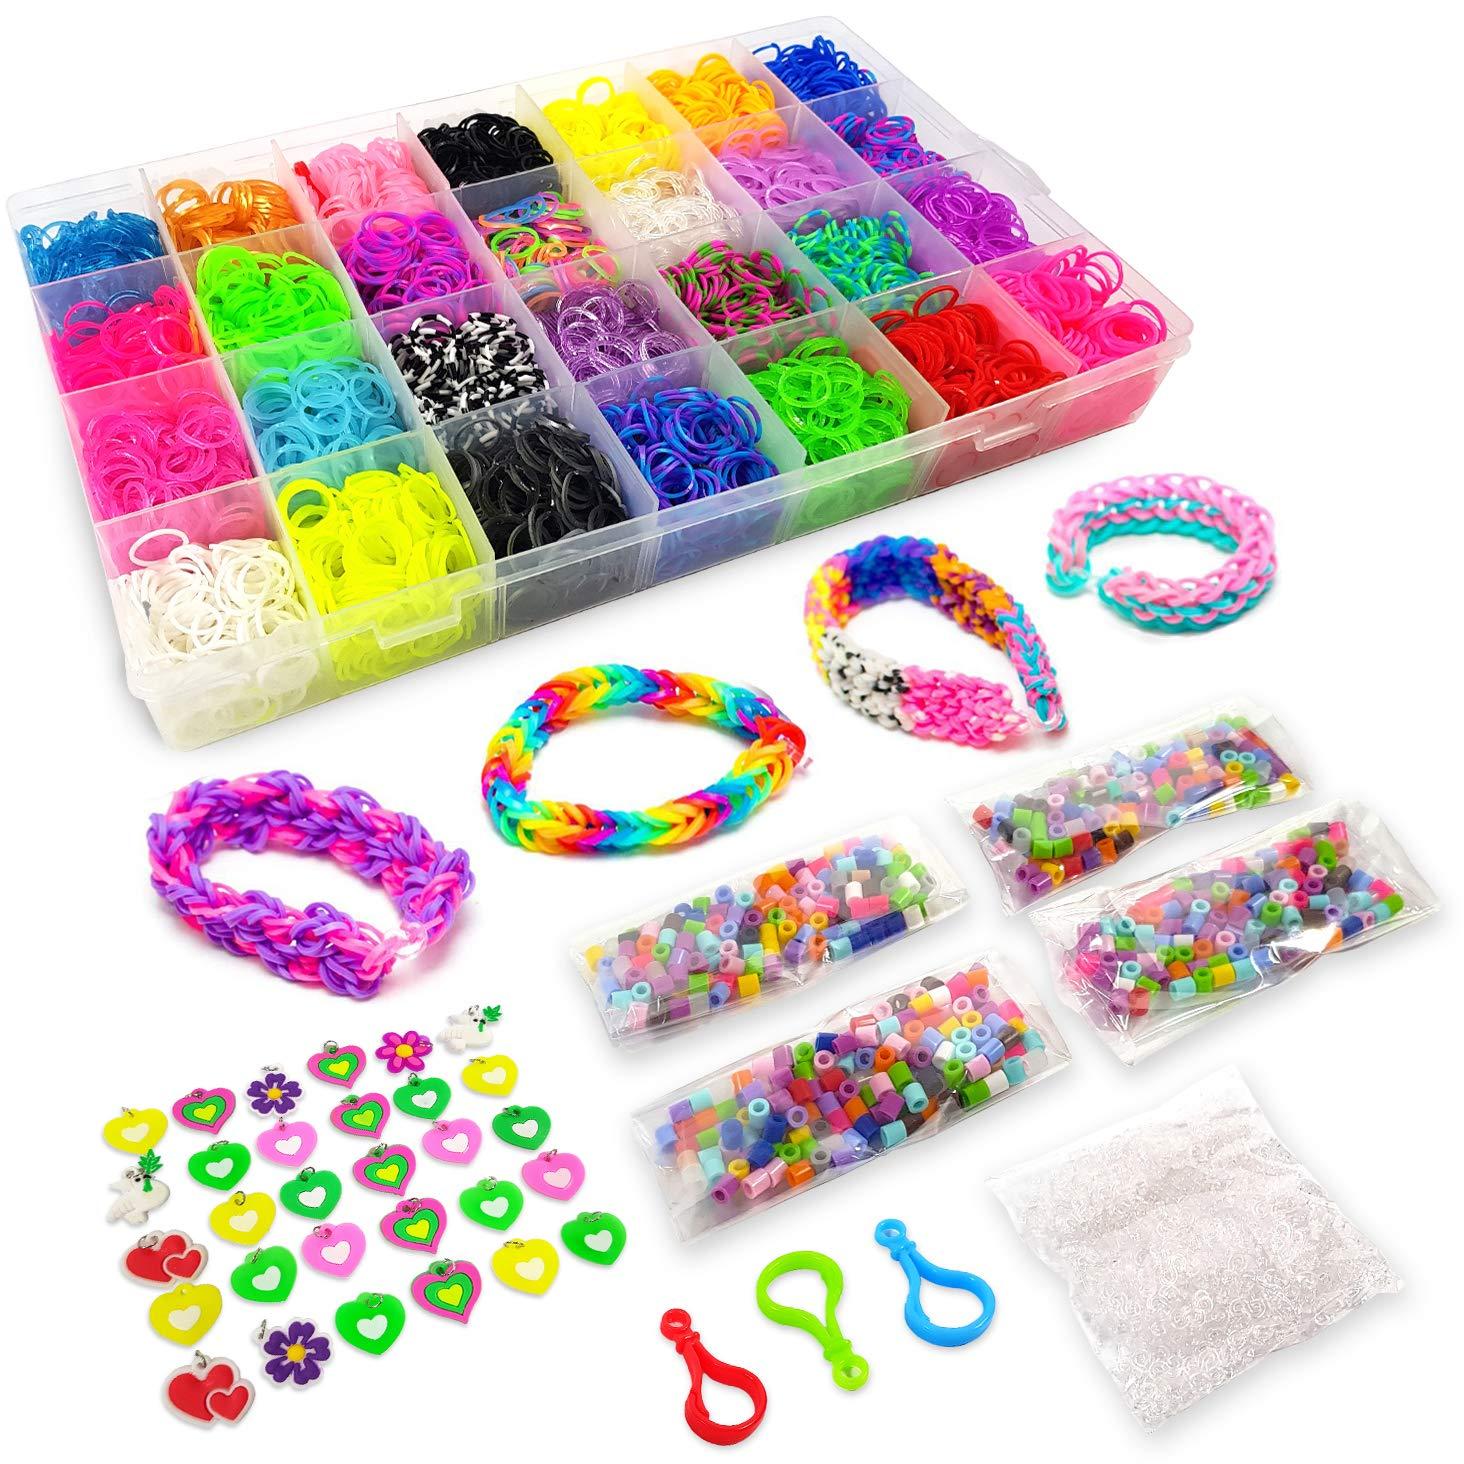 11950+ Colorful Bands Mega Refill Loom Kit - Rubber Band Bracelet Kit - 10500 Premium Crazy Loom Rubber Bands, 30 Charms, 5 Hooks, 250 Beads, 550 Clips - DIY Crafts Making Bracelets 42 Colors by Toys World Shop